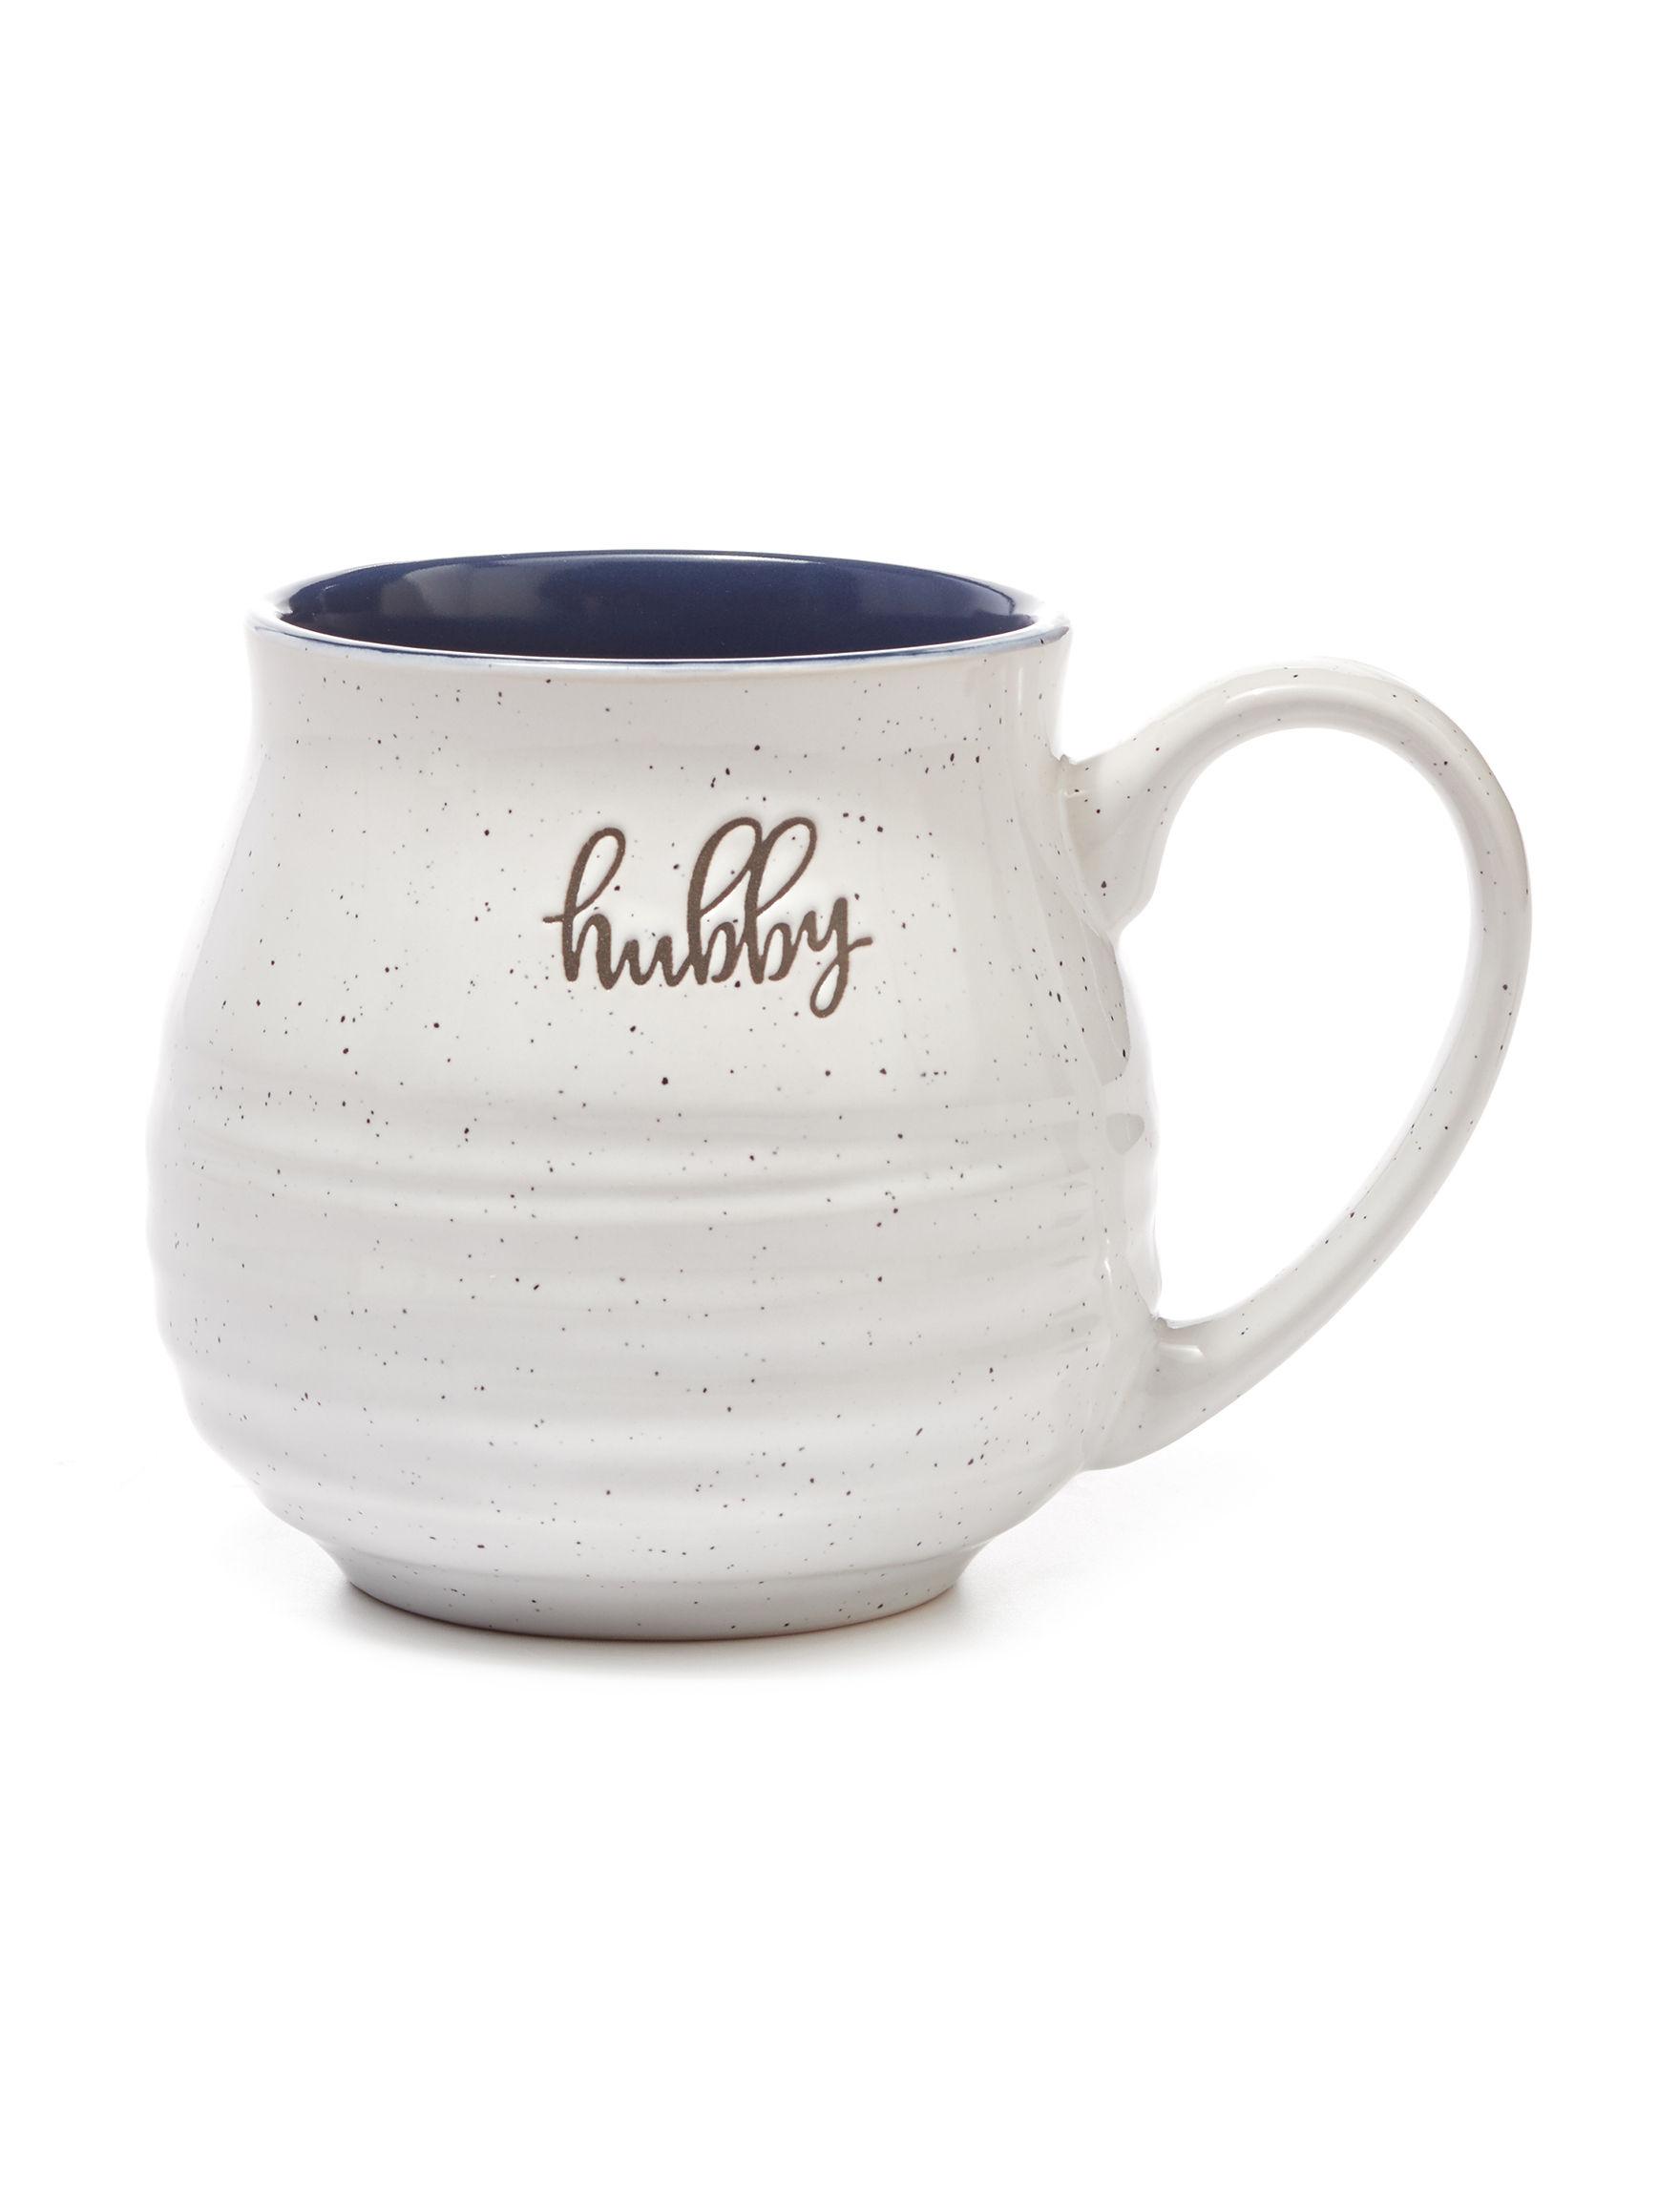 Enchante Grey / Black Mugs Drinkware